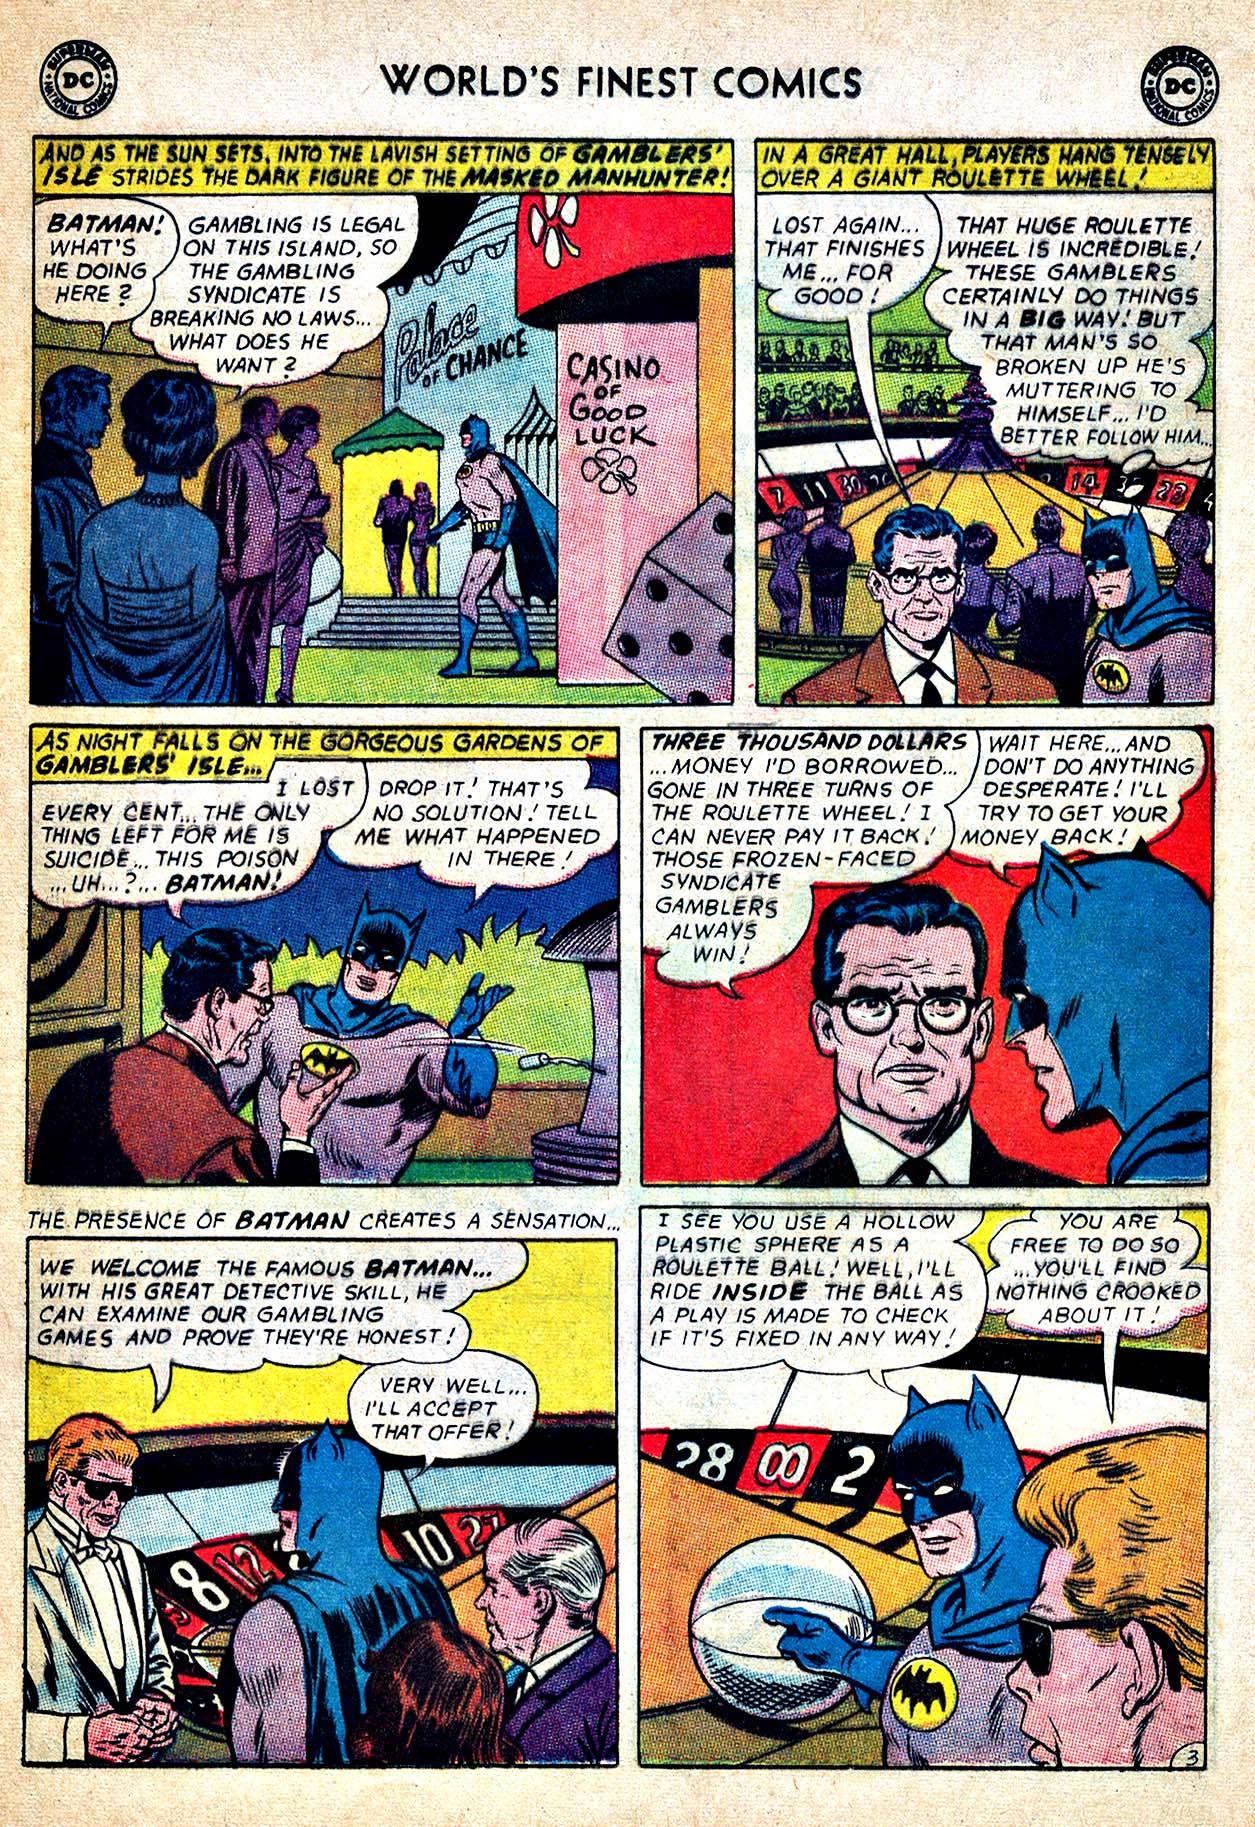 Read online World's Finest Comics comic -  Issue #150 - 5